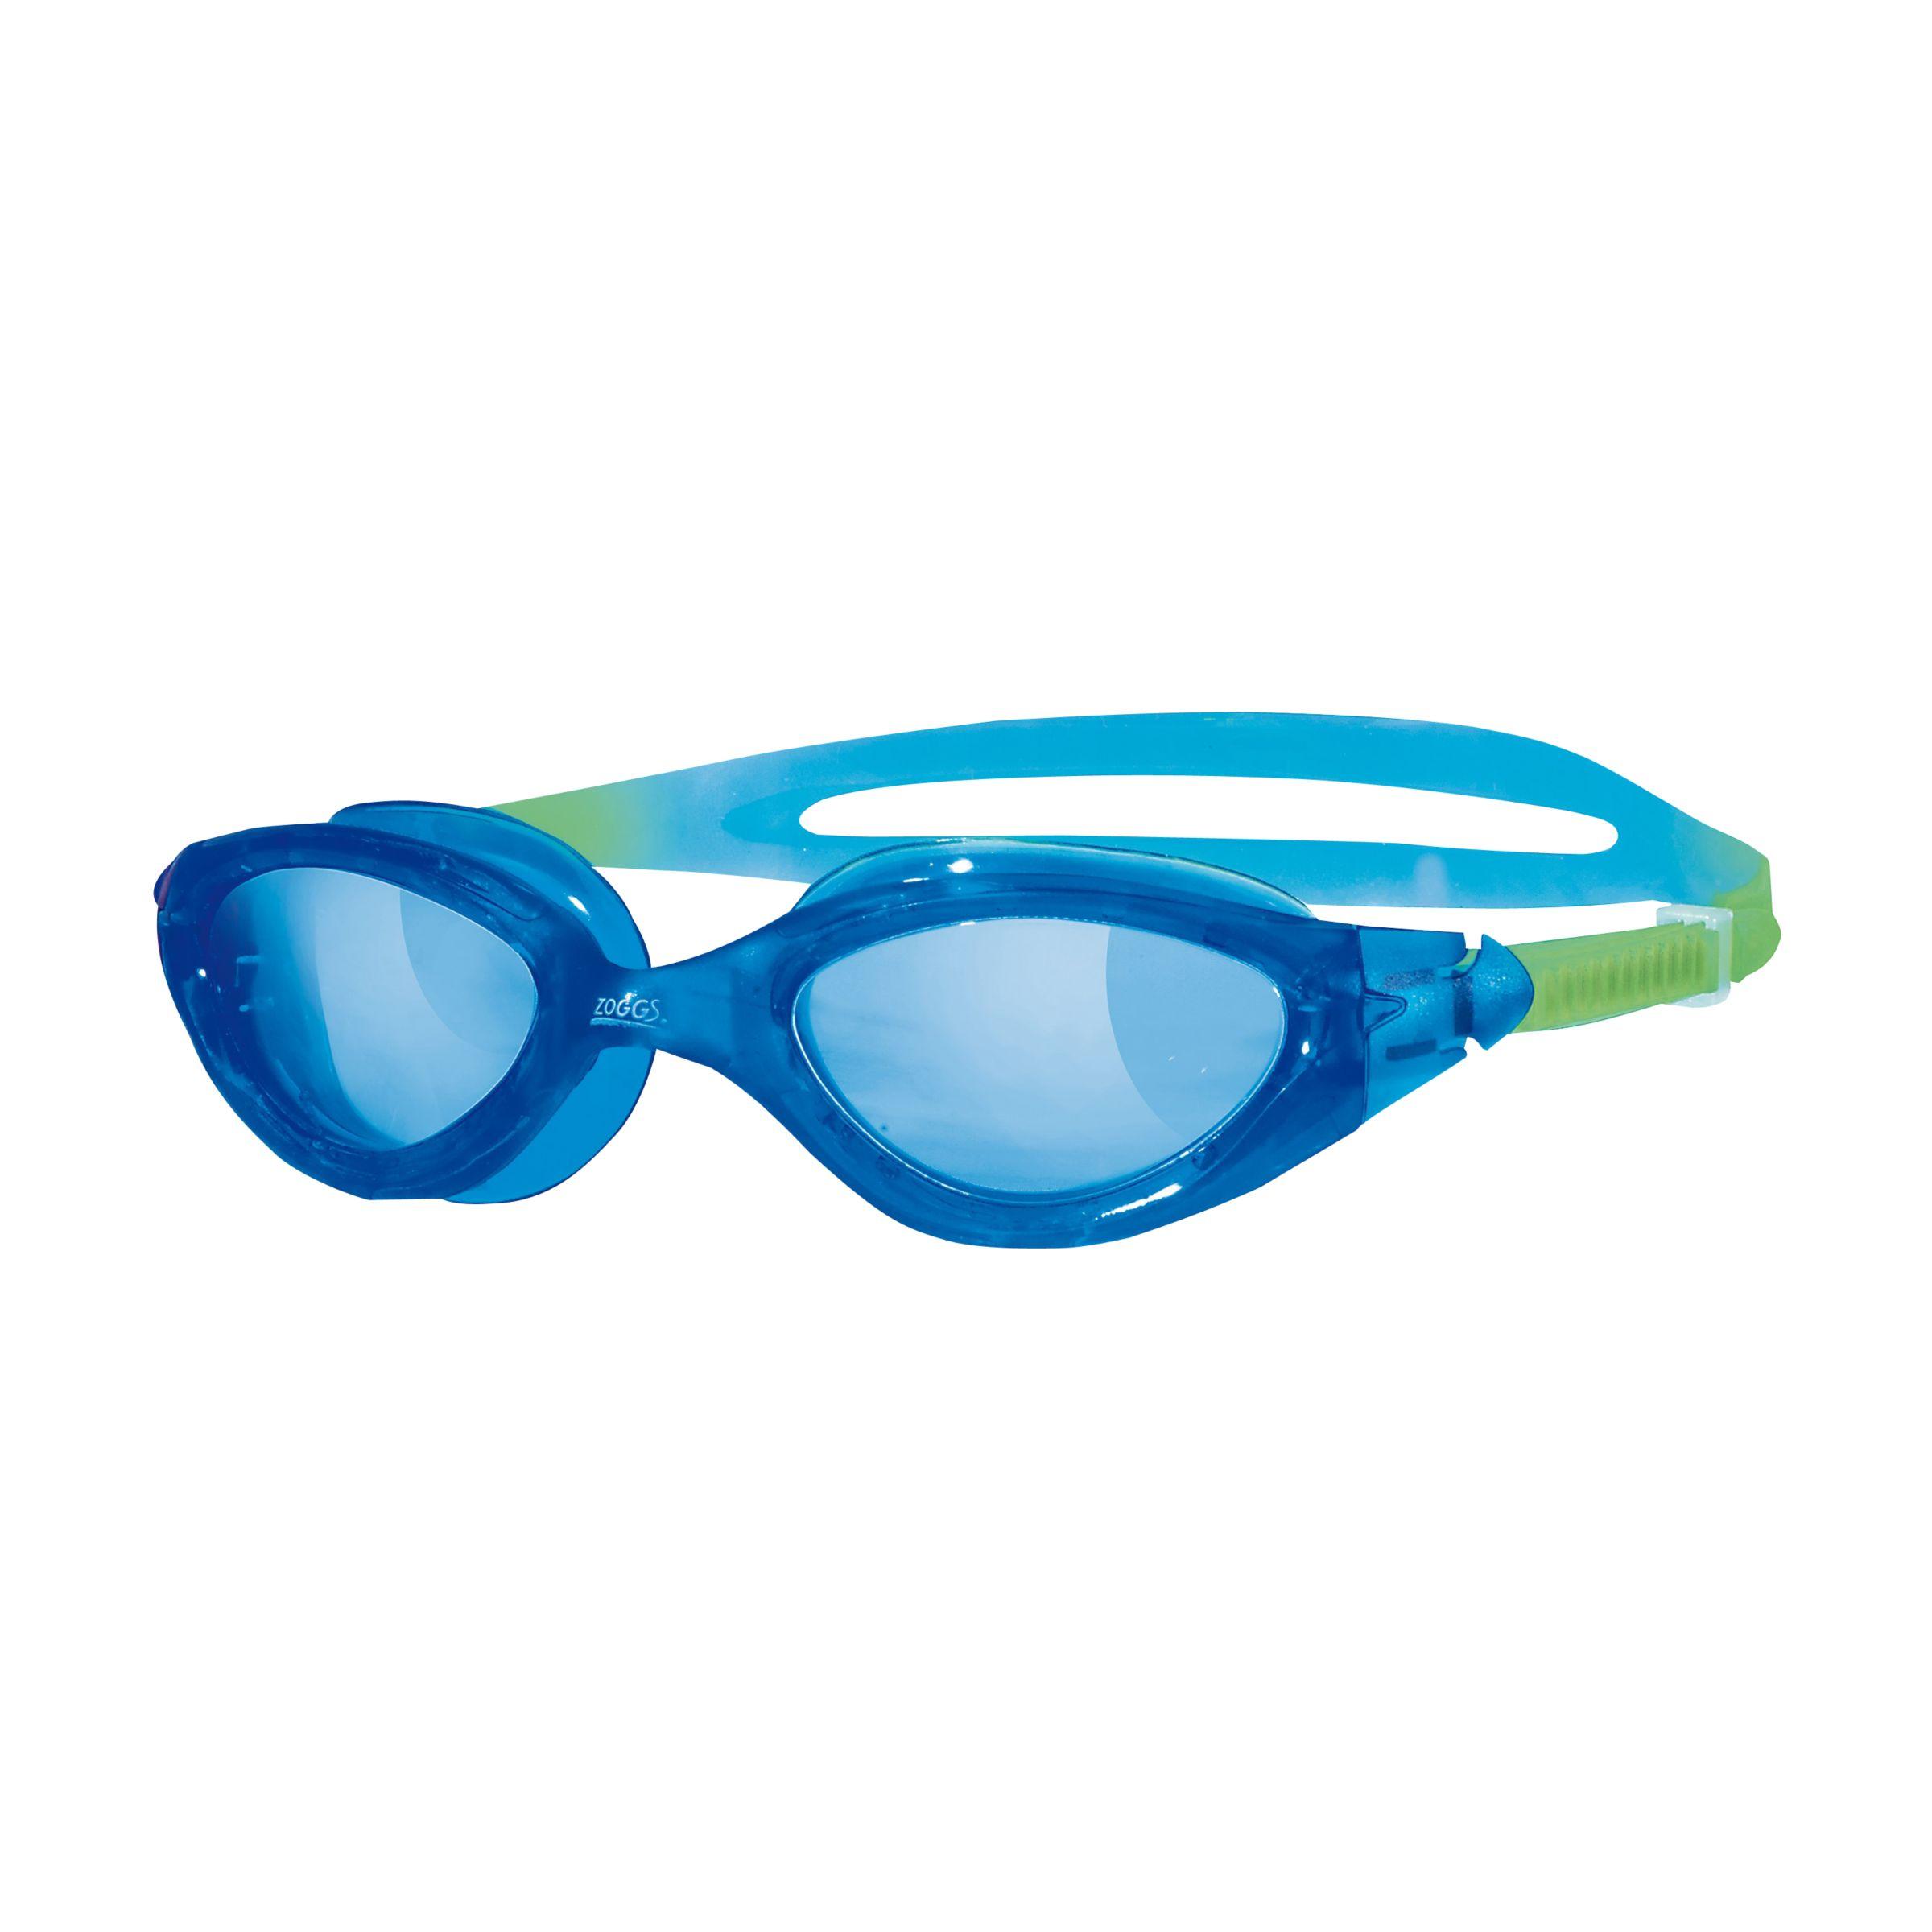 Zoggs Zoggs Panorama Junior Swimming Goggles, Blue/Pink